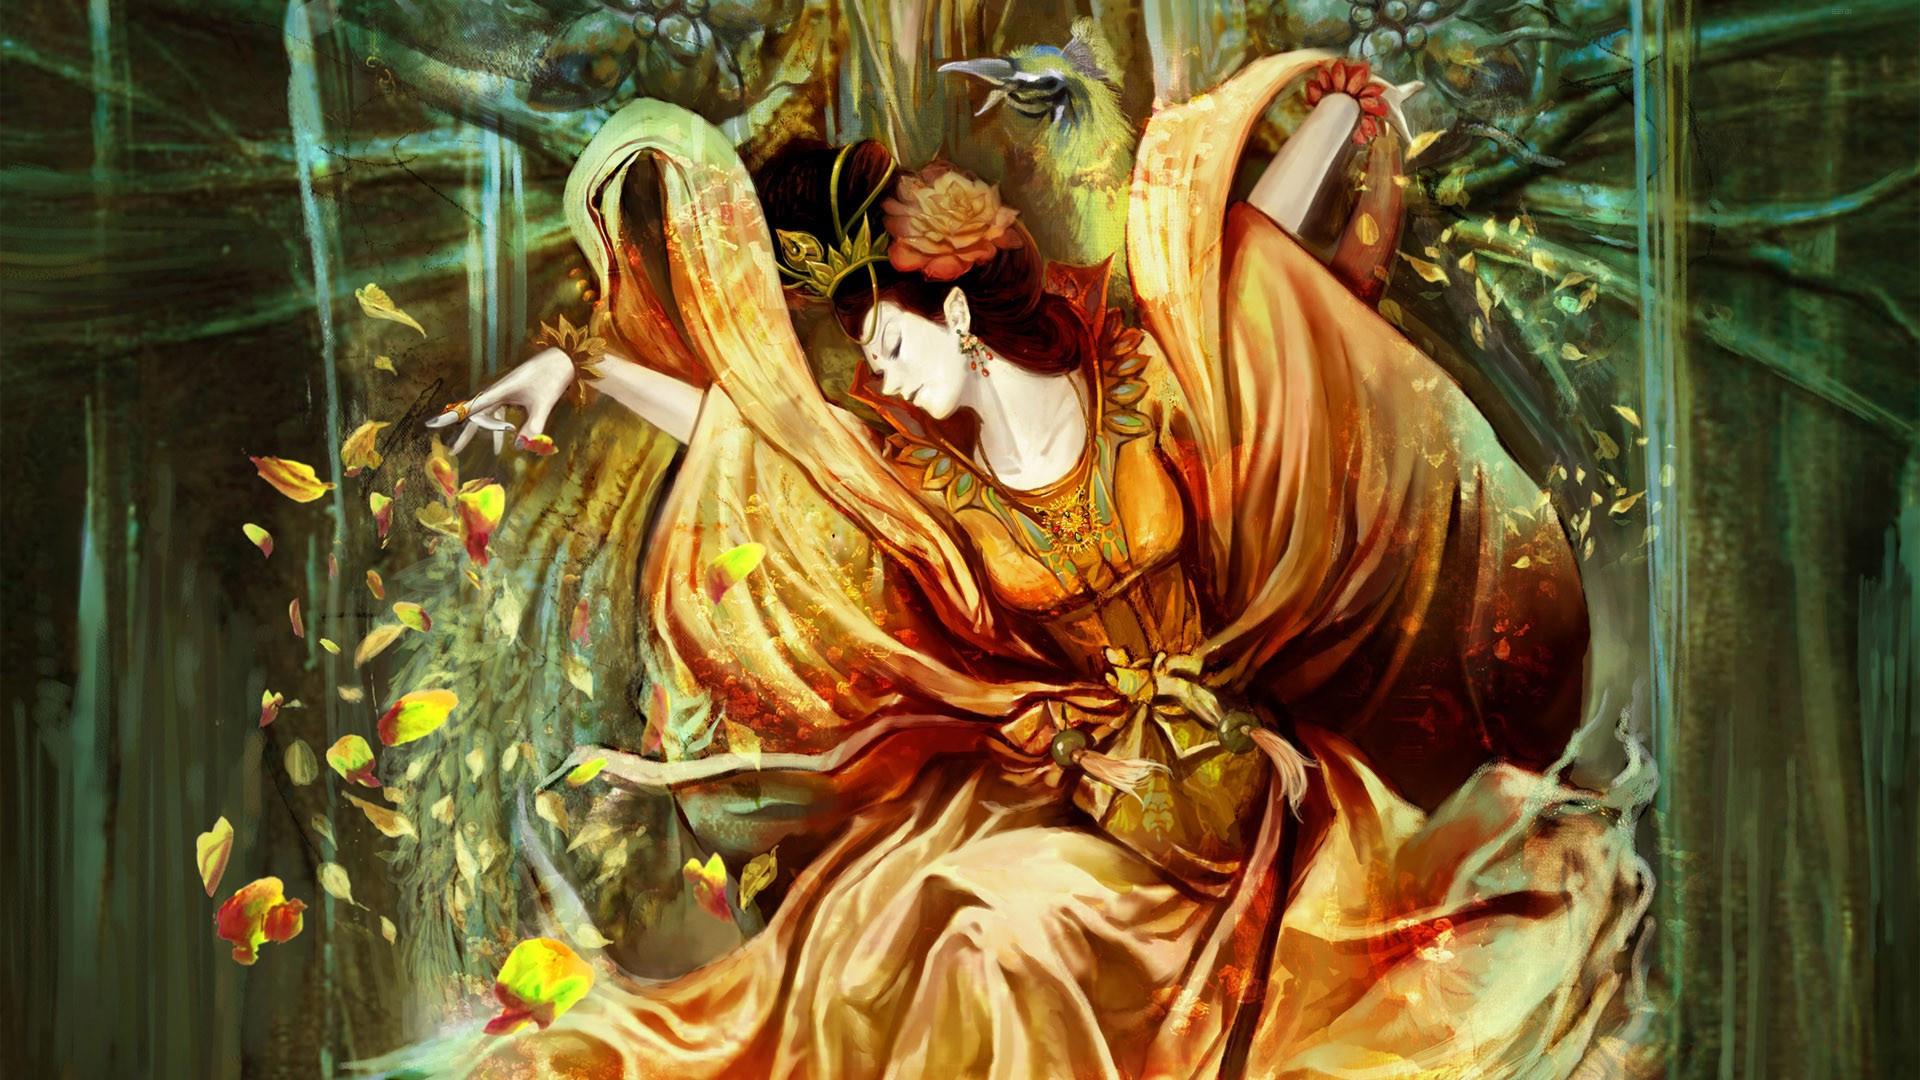 anime geisha wallpaper 234148 geisha with rose petals 1920x1080